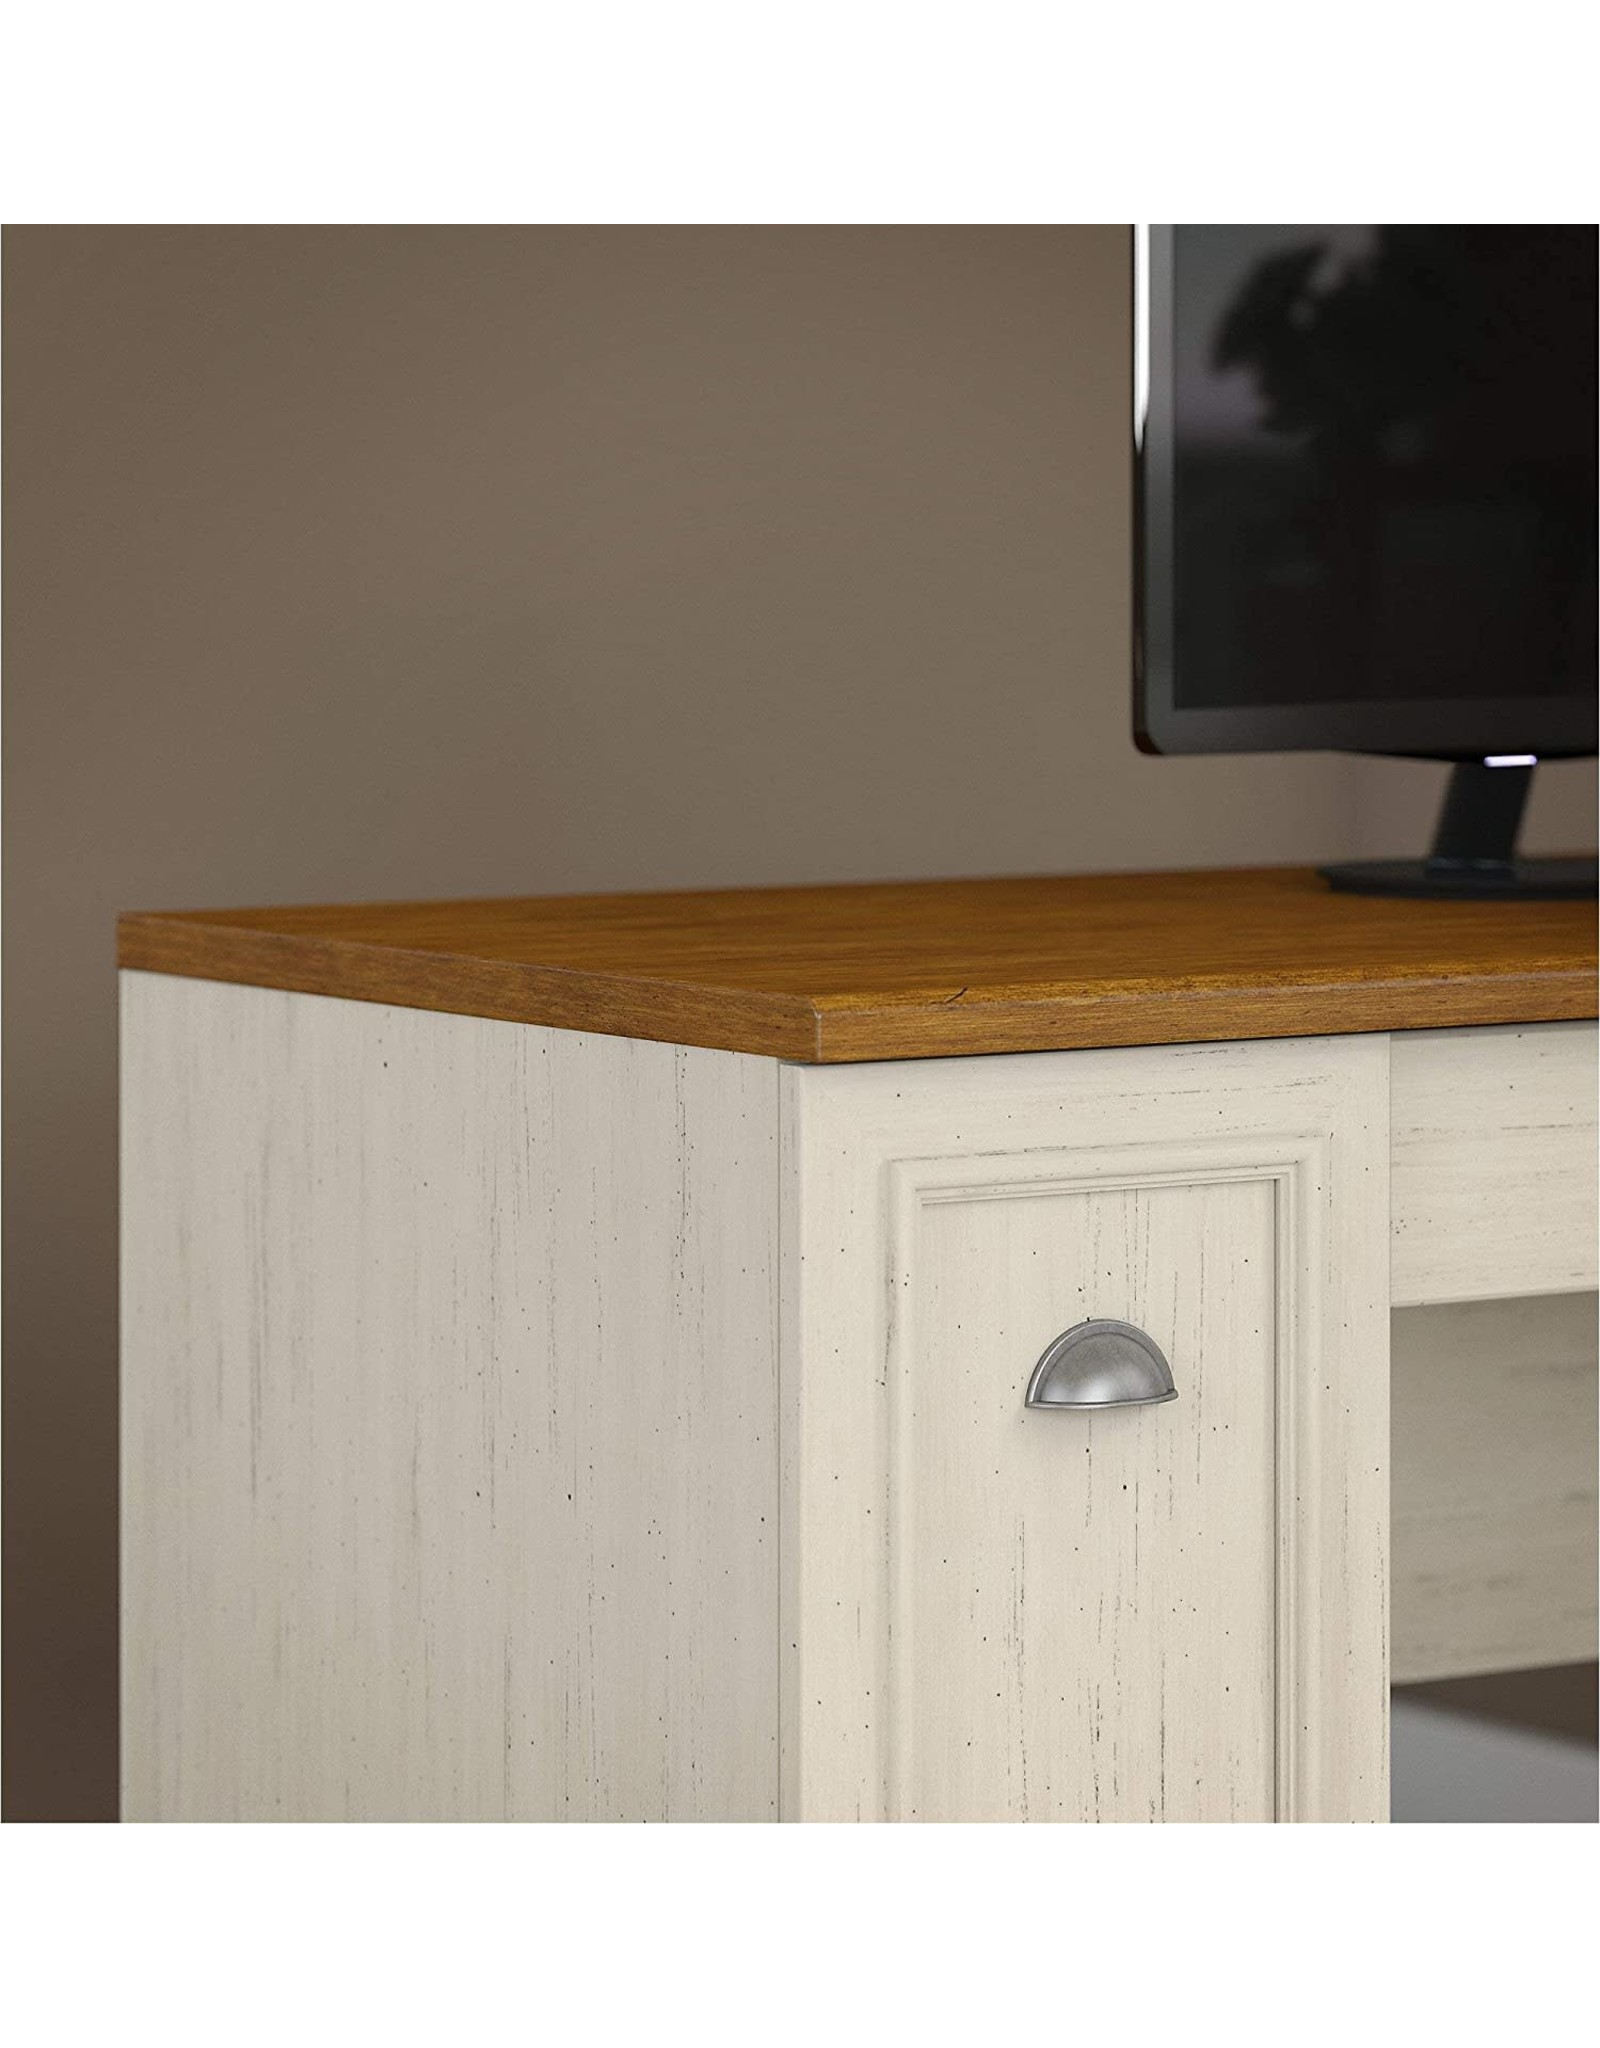 Bush Furniture Bush Furniture Fairview L Shaped Desk in Antique White